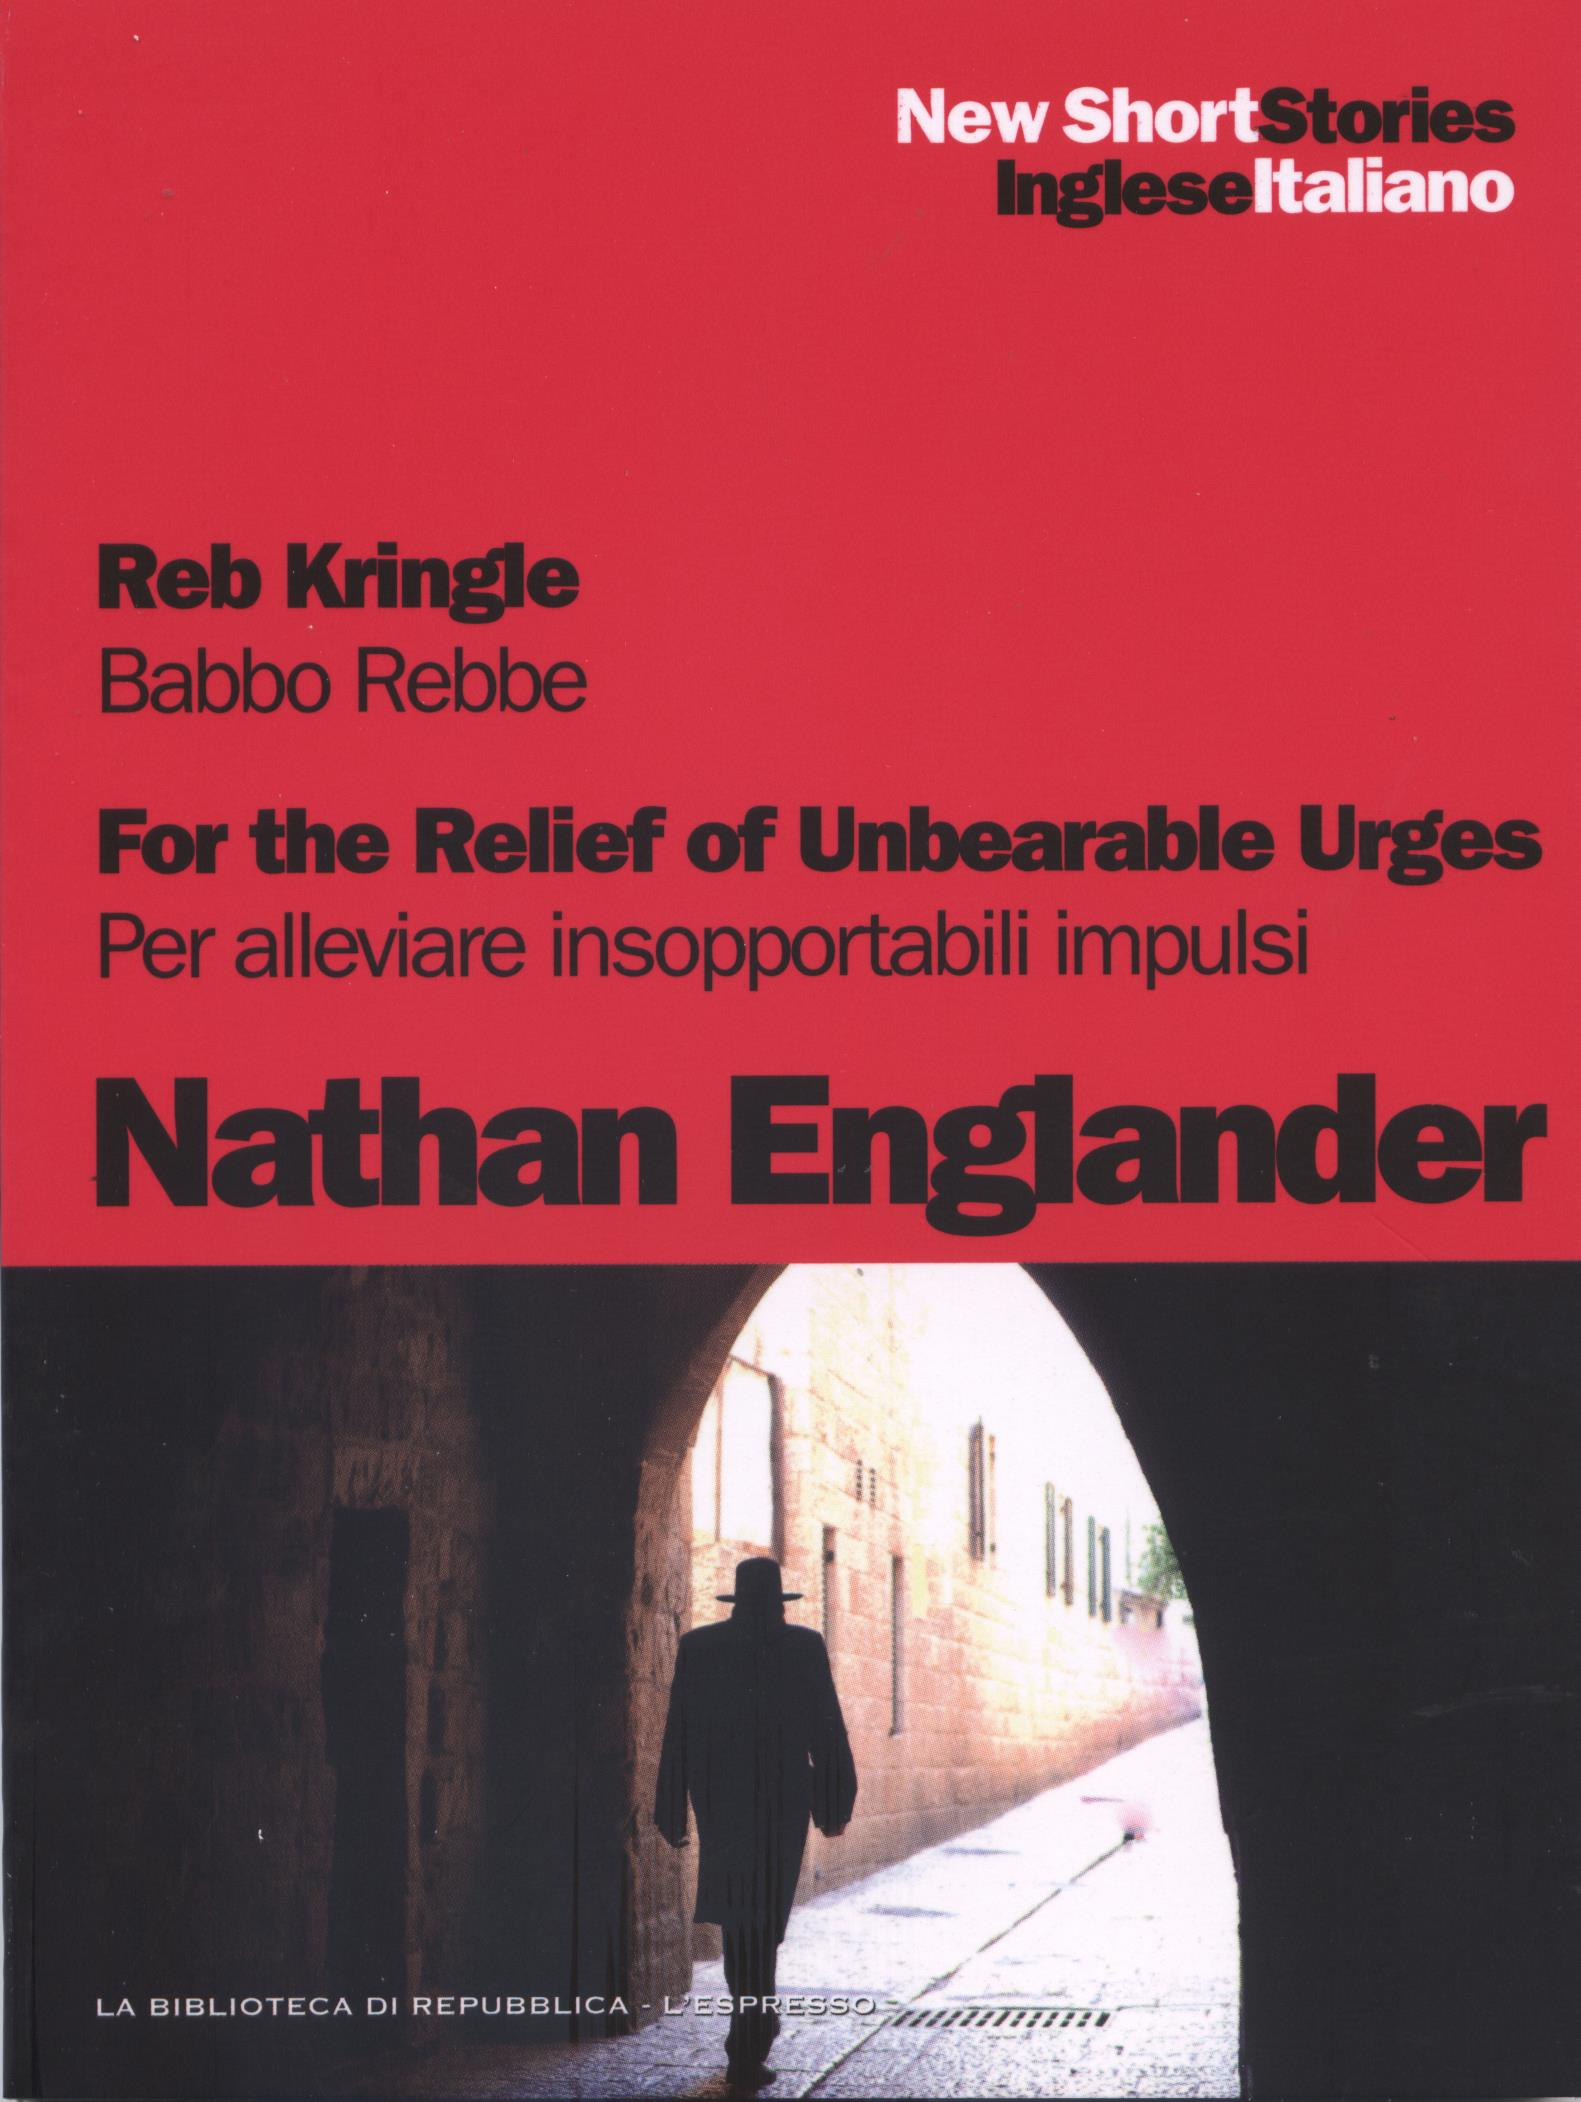 Reb Kringle - For the relief of unbearable urges / Babbo Rebbe - Per alleviare insopportabili impulsi